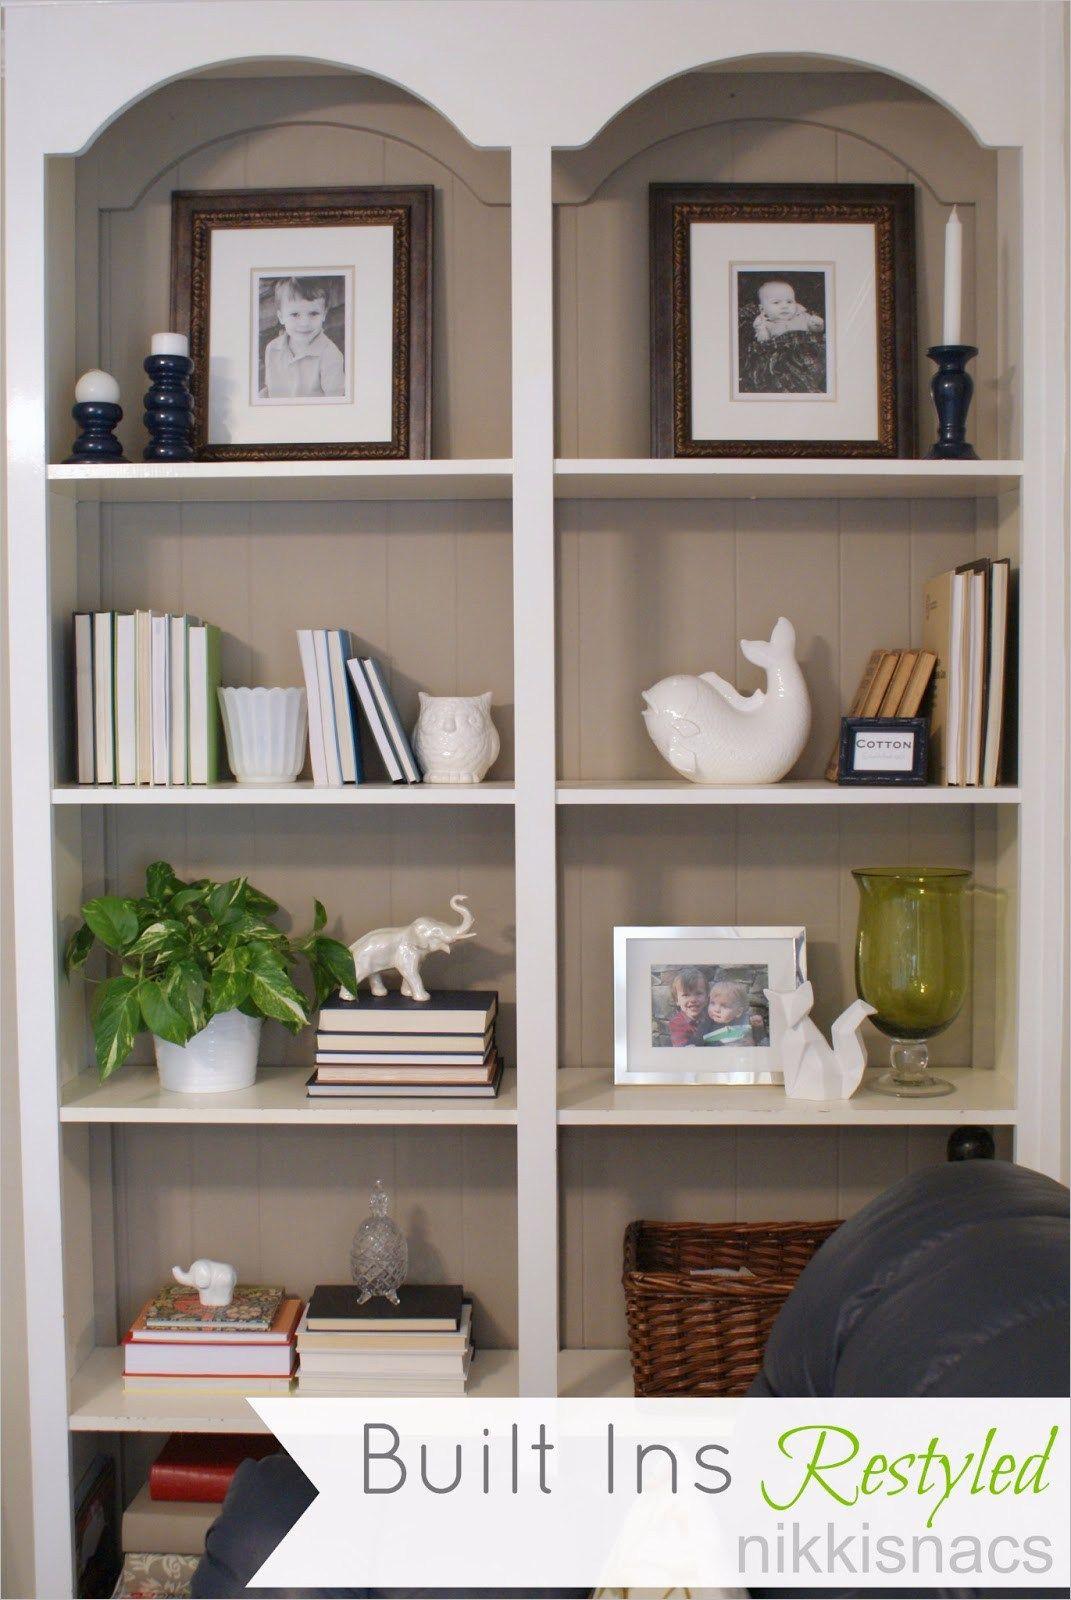 41 Creative Decorating Built In Shelves 36 Nikkis Nacs The Built